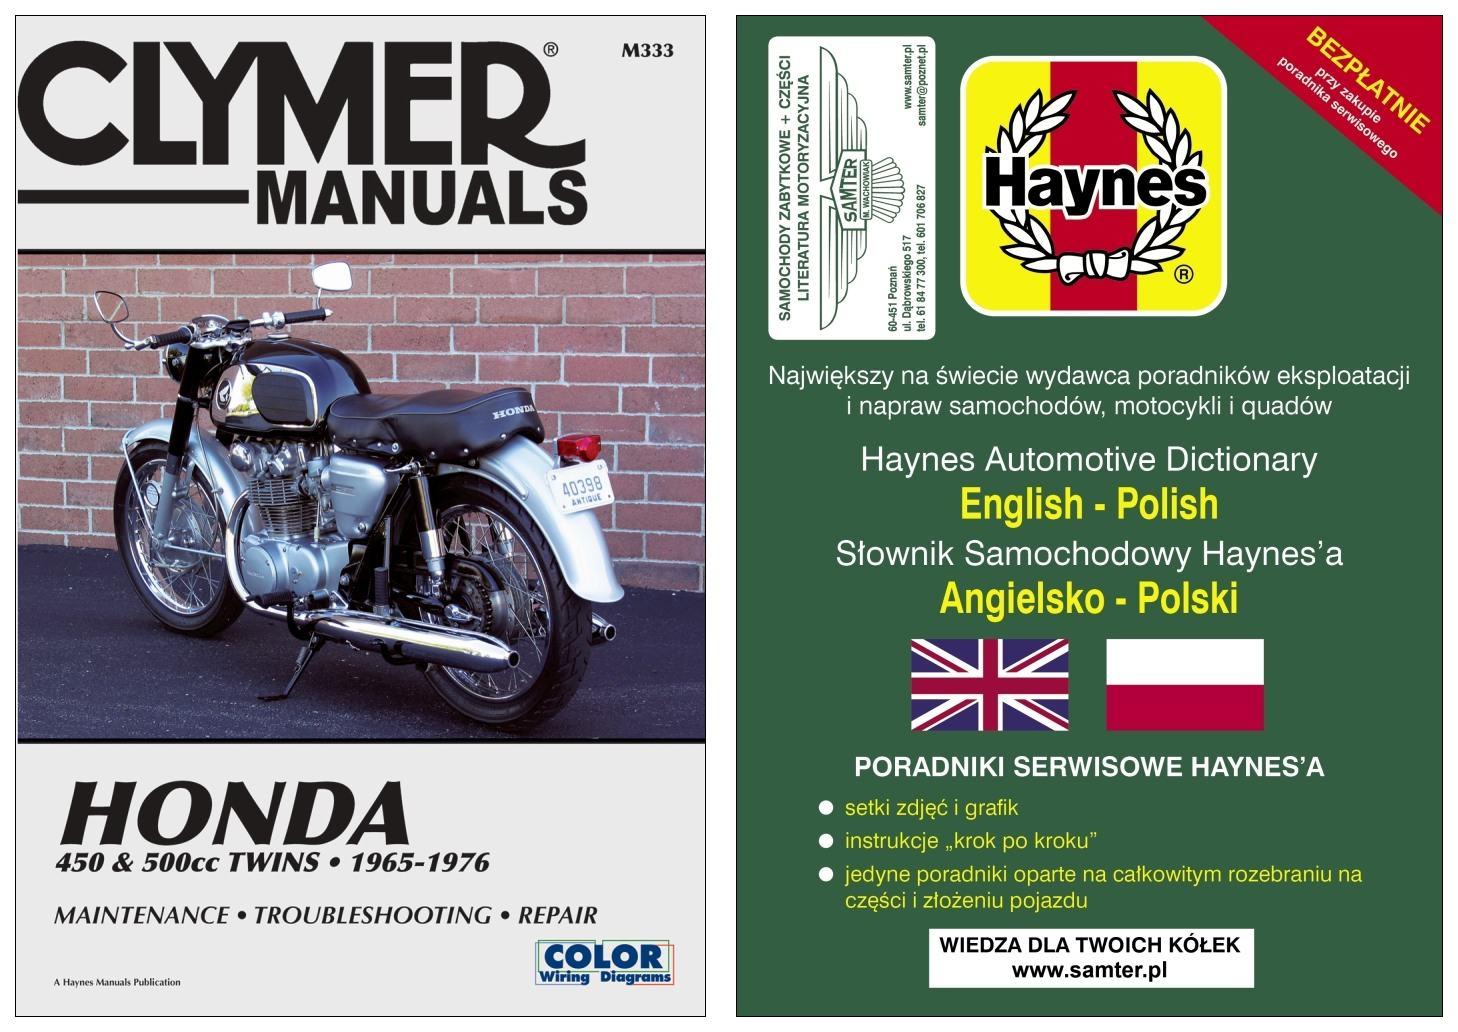 Honda Cb 450 Cl450 Cb500t 1965 1976 Instr Napraw 7263786931 Wiring Diagram